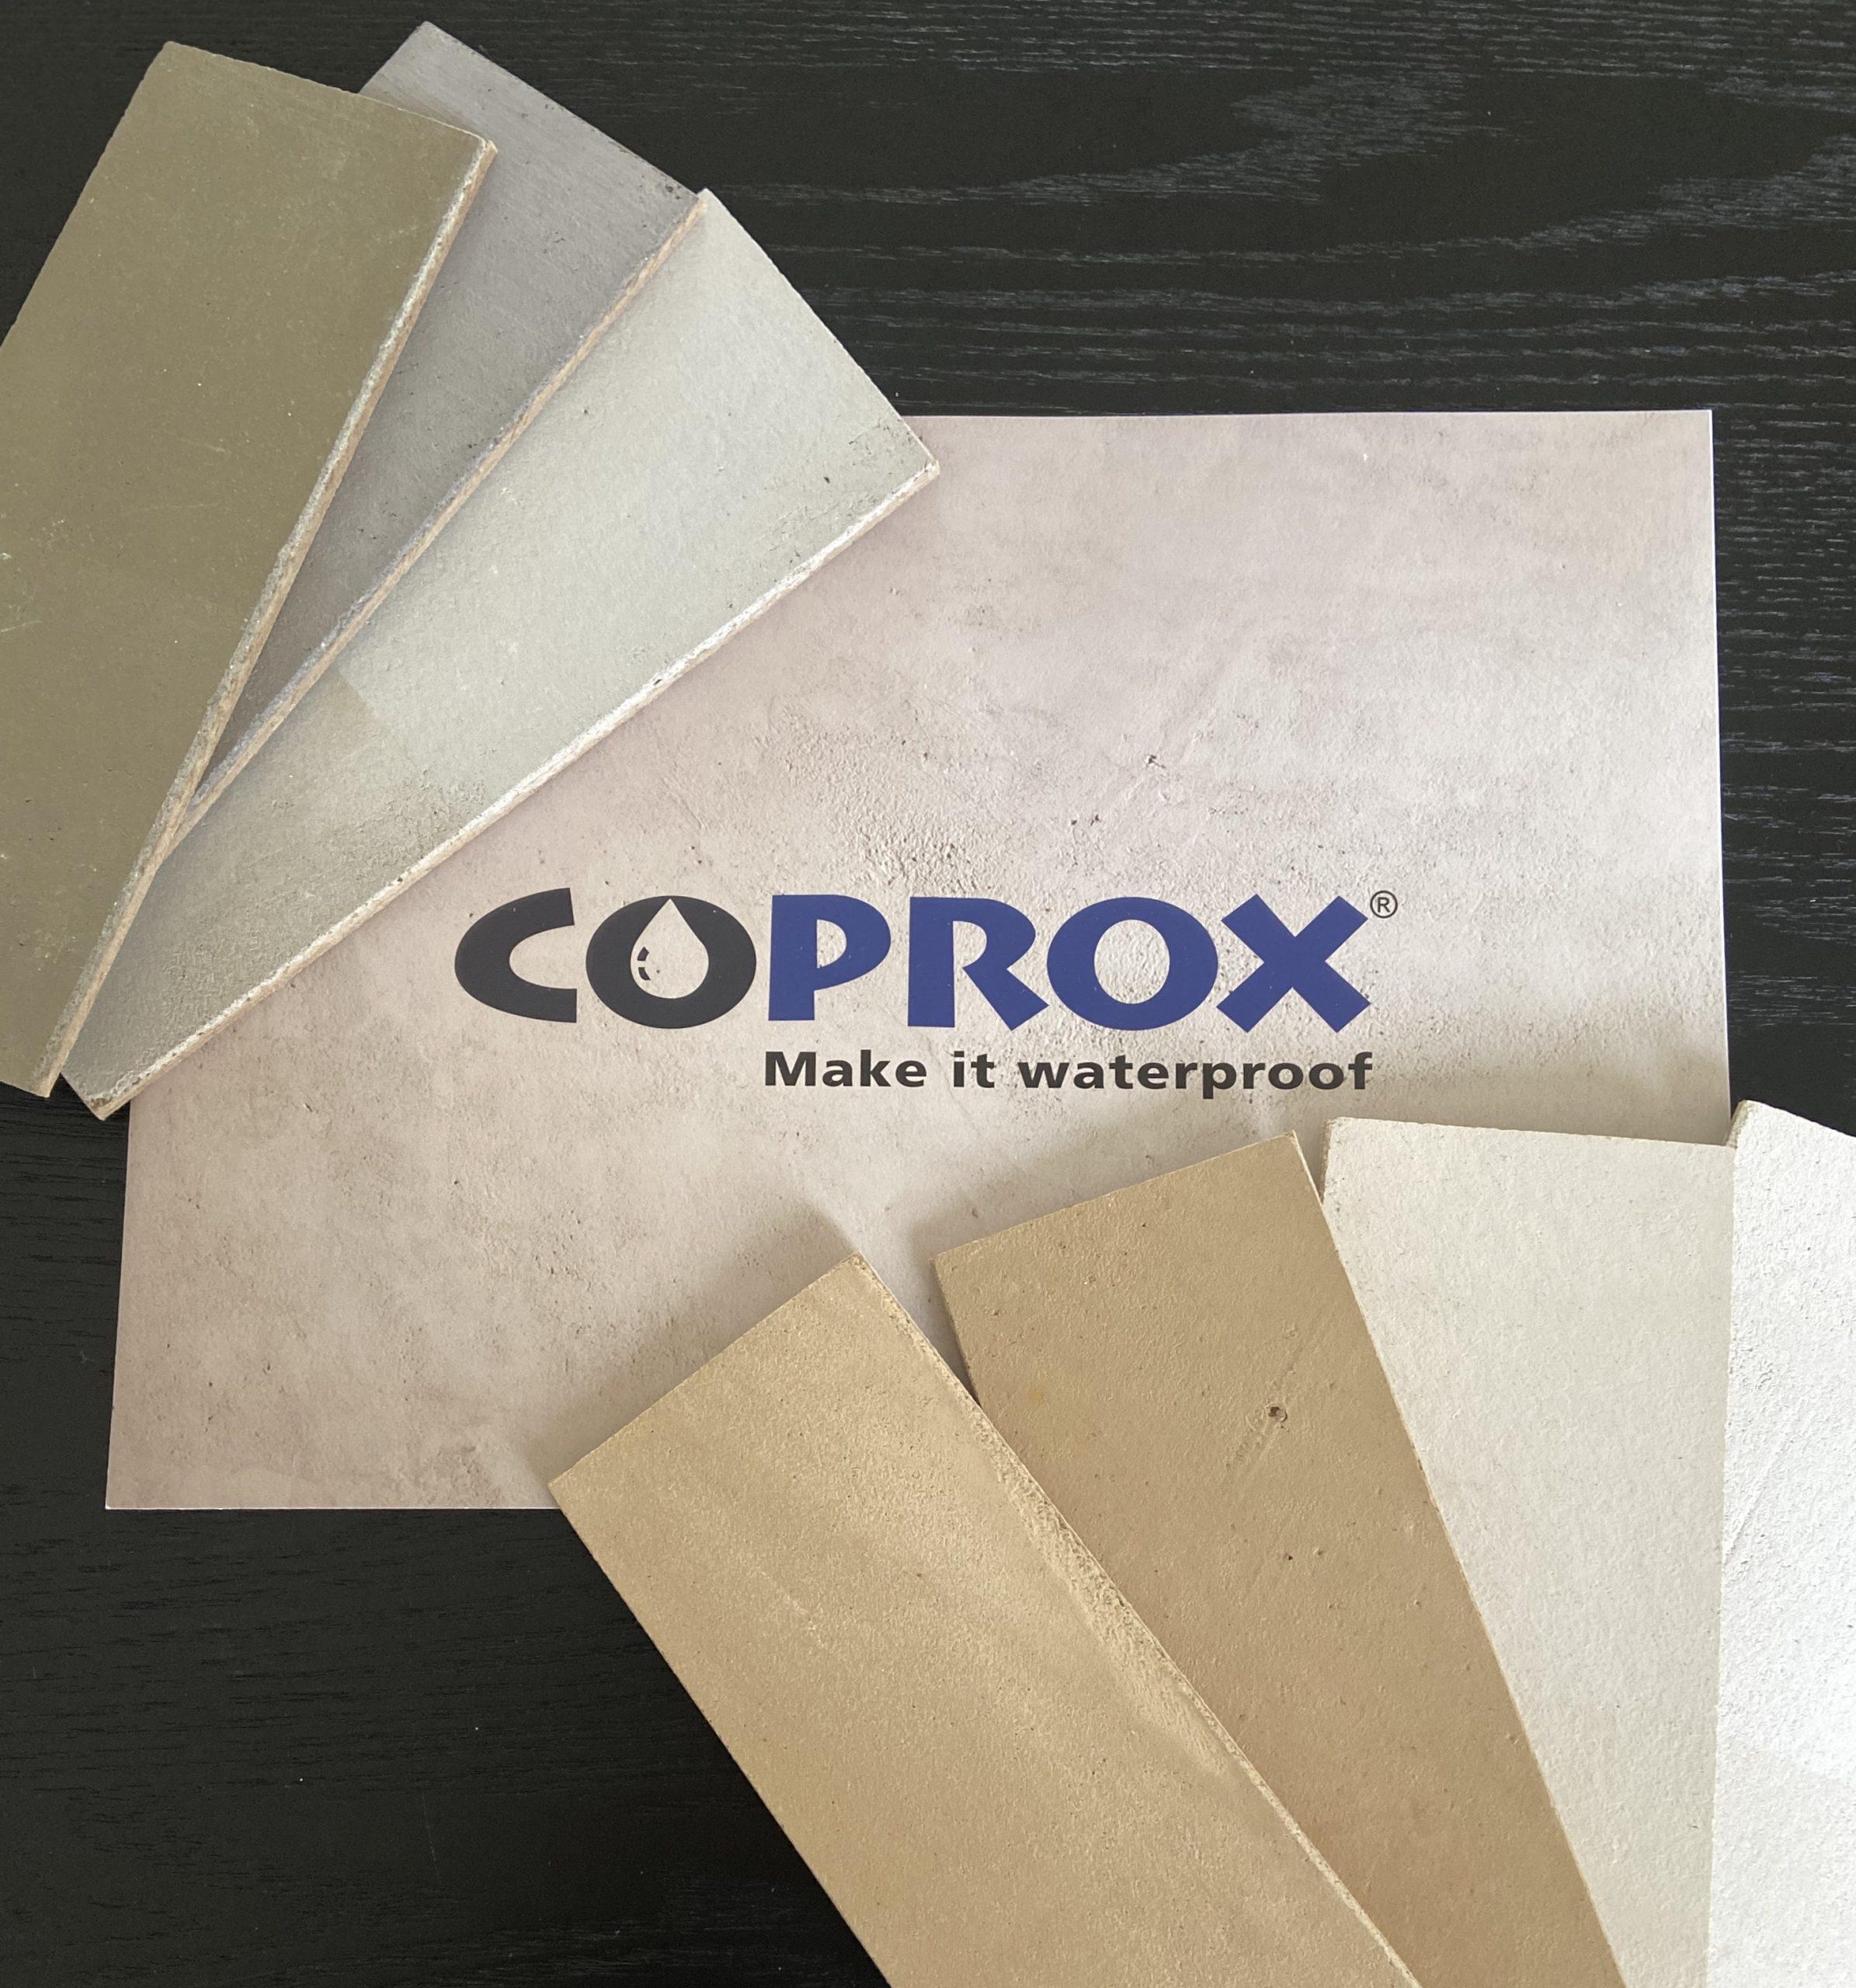 Coprox